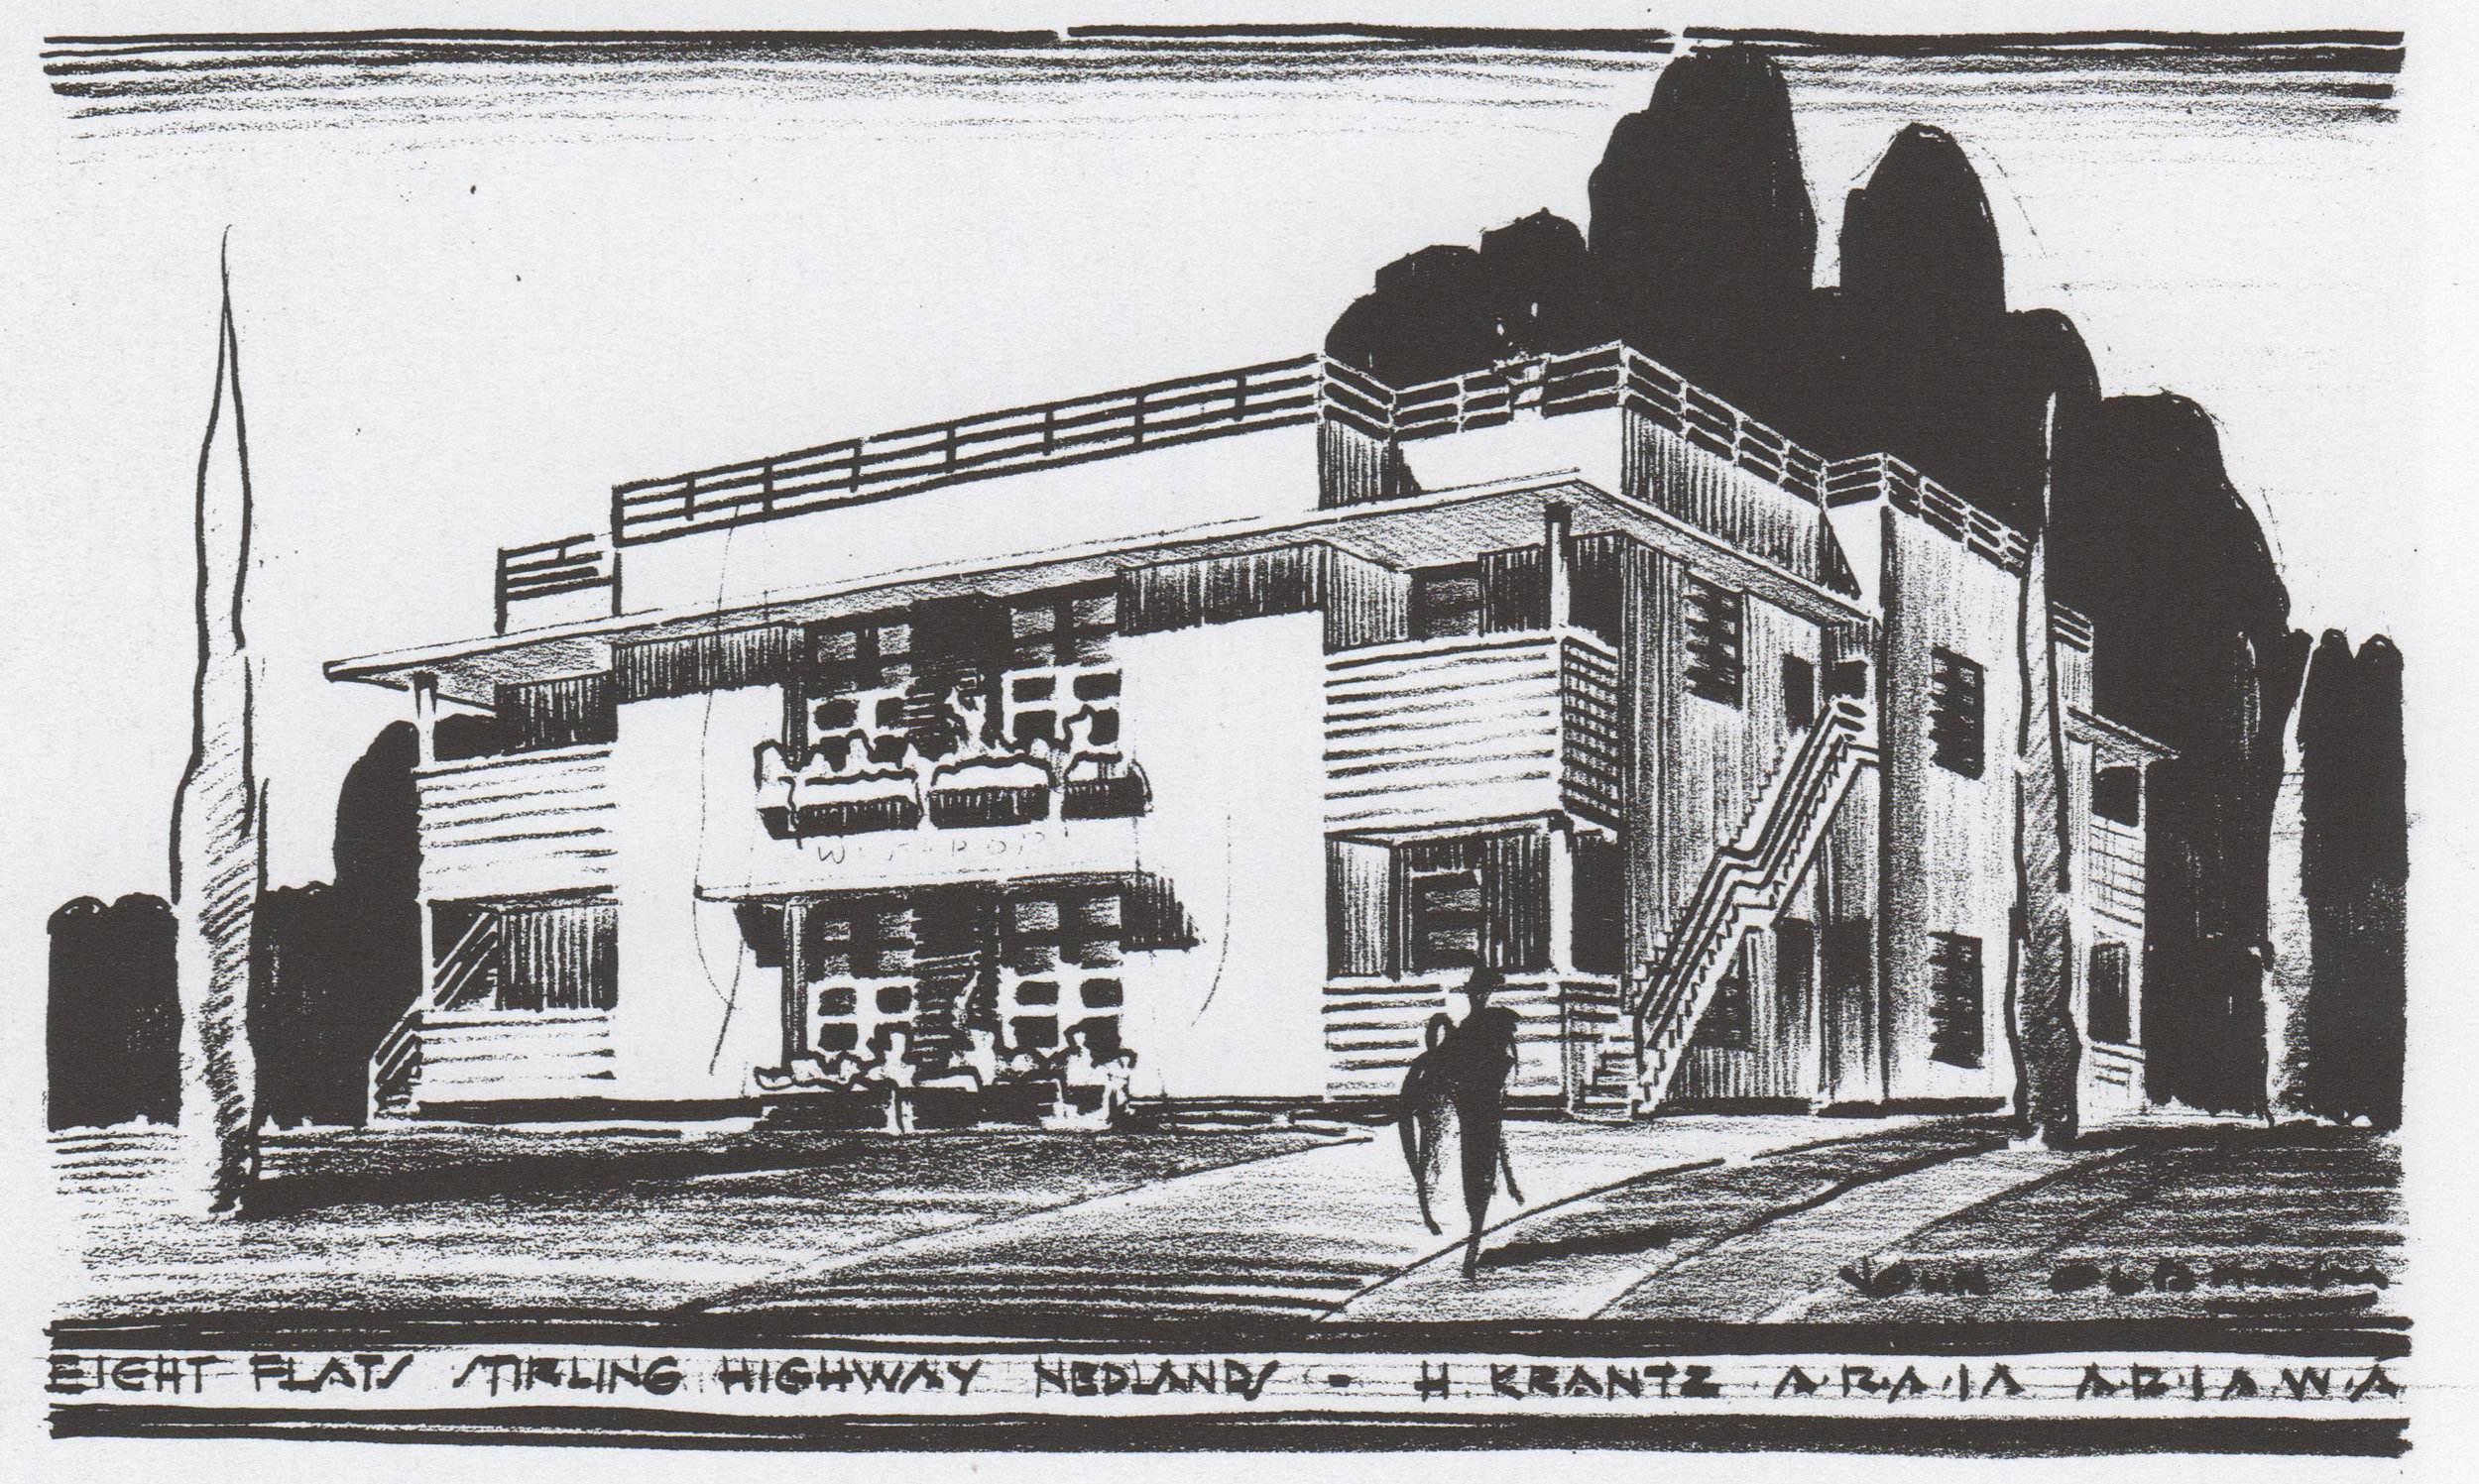 Varsity Flats, Stirling Highway, Nedlands